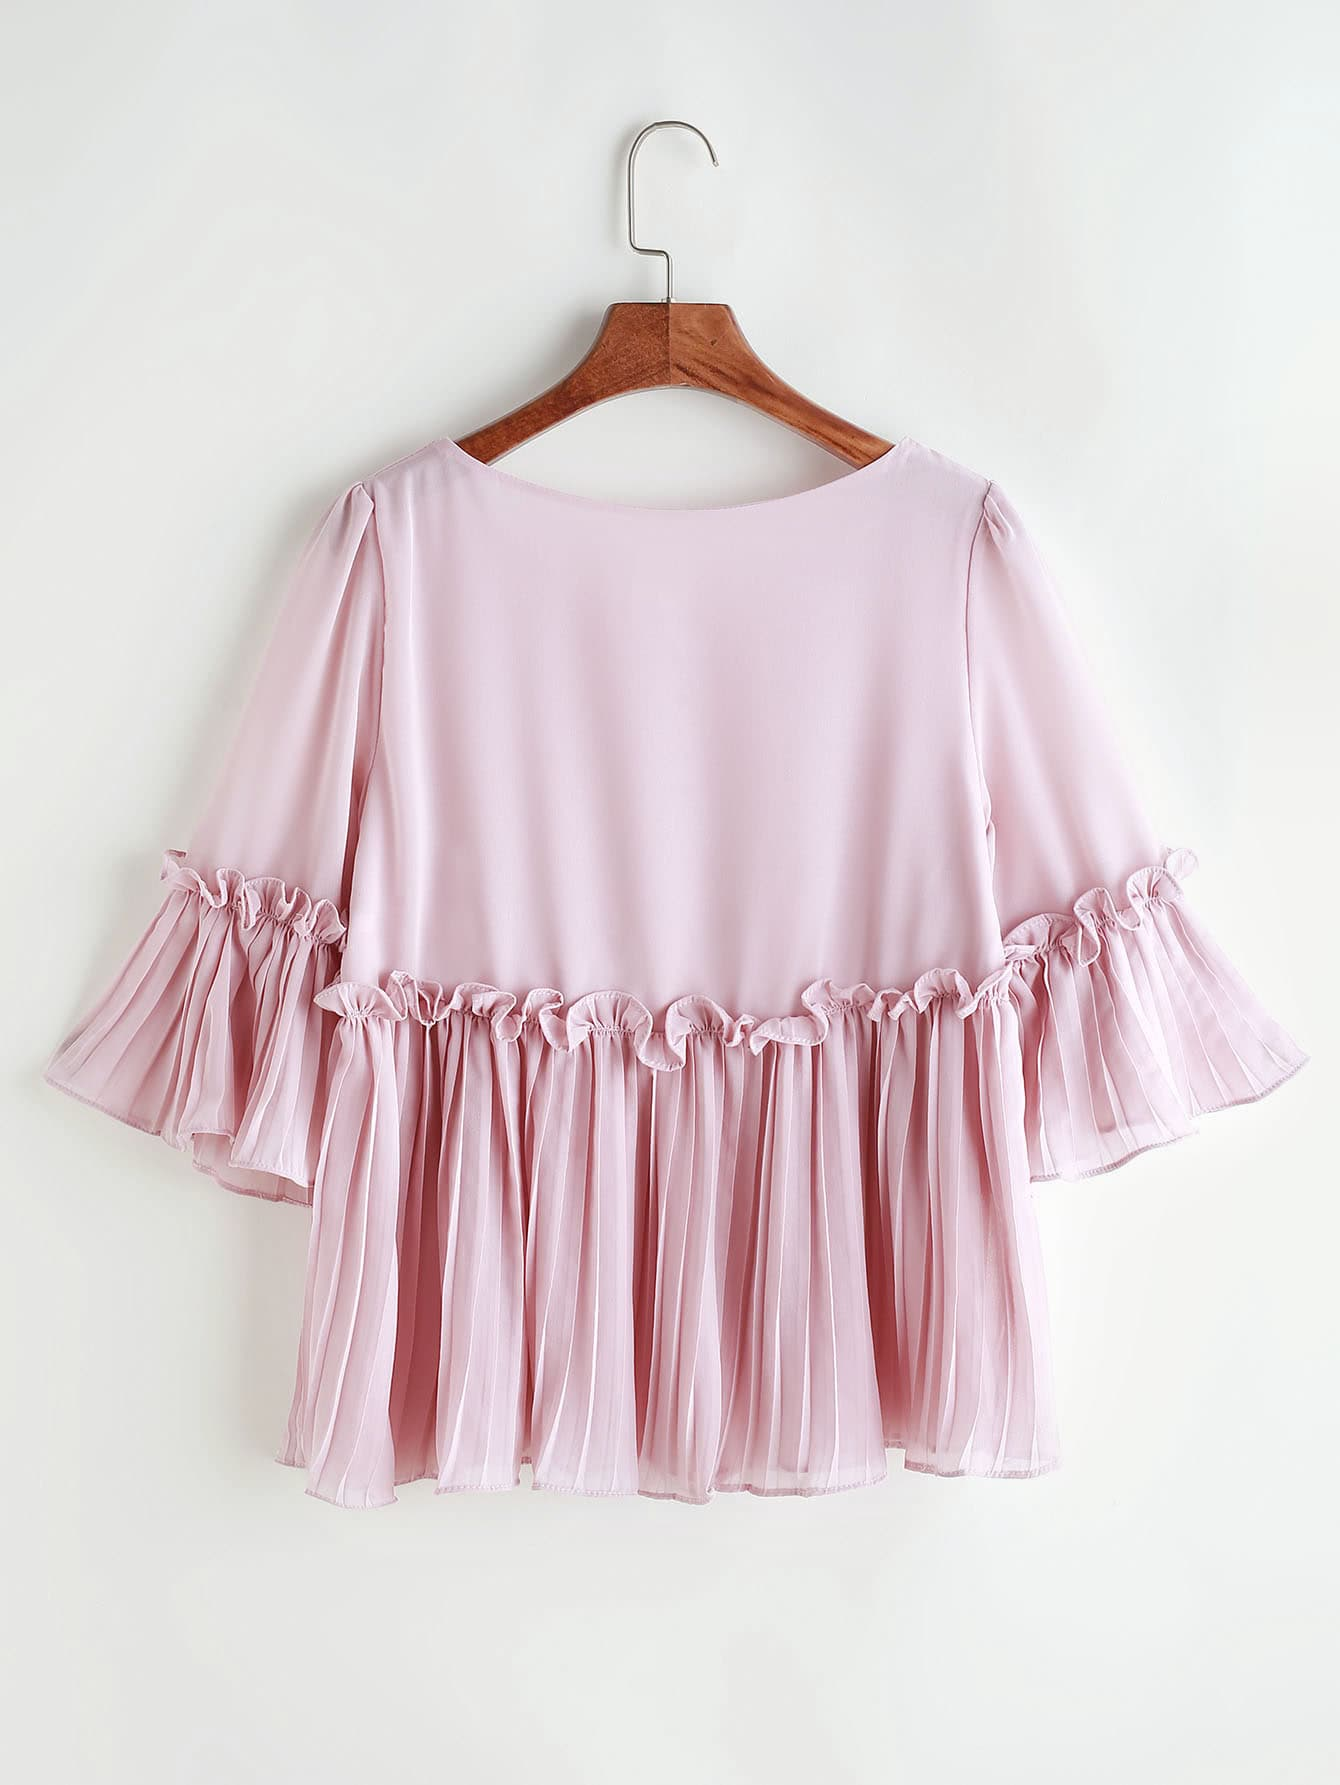 blouse170403450_2